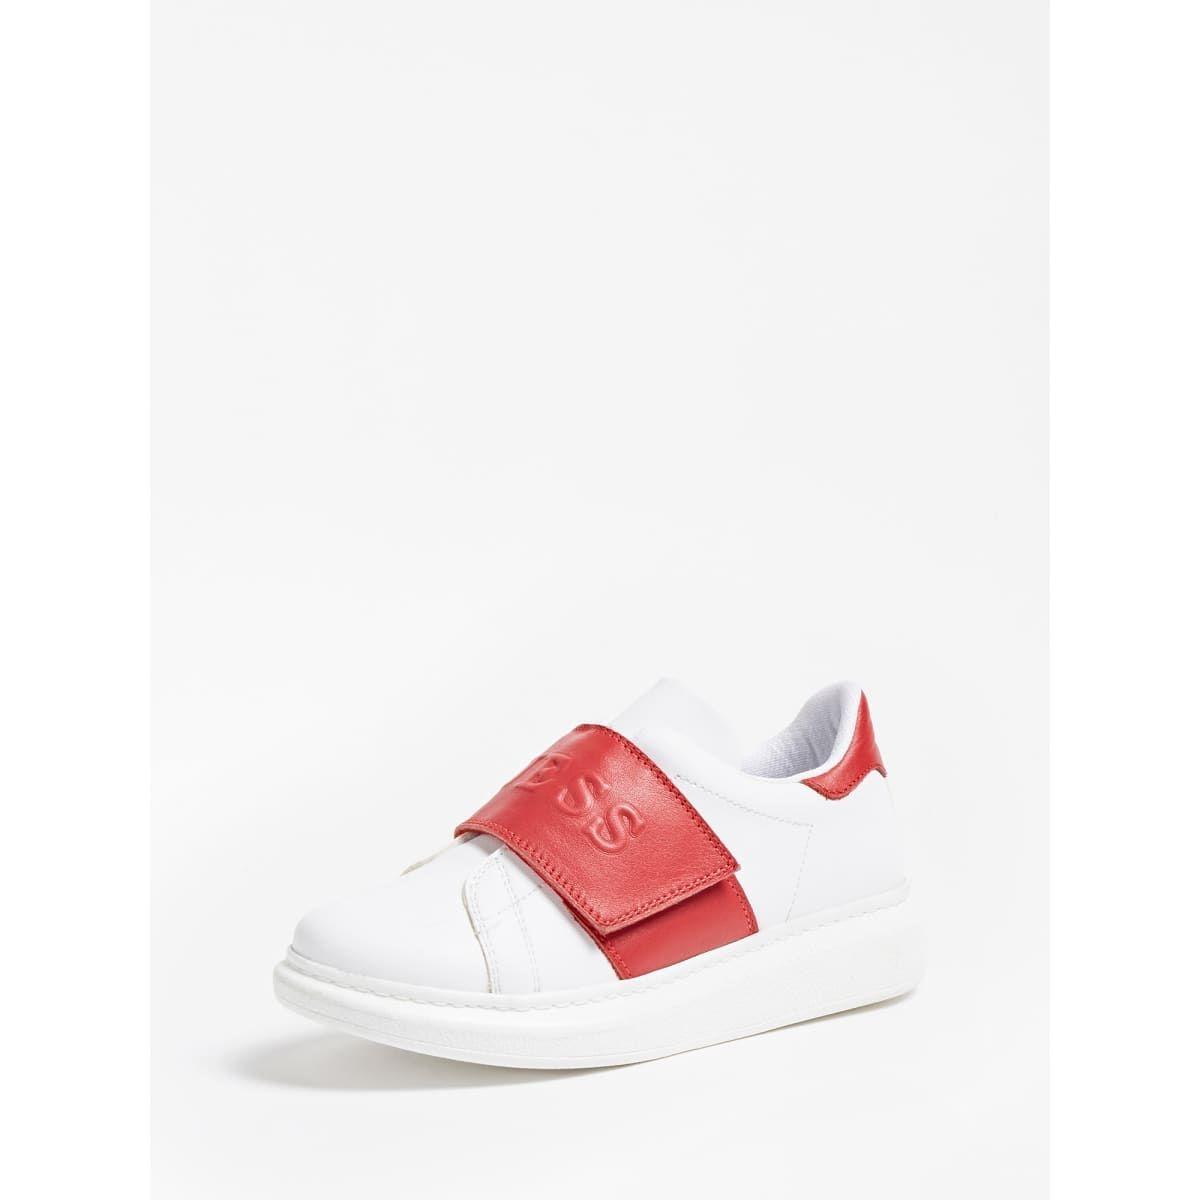 Sneaker New Edgy Logo (27-34)